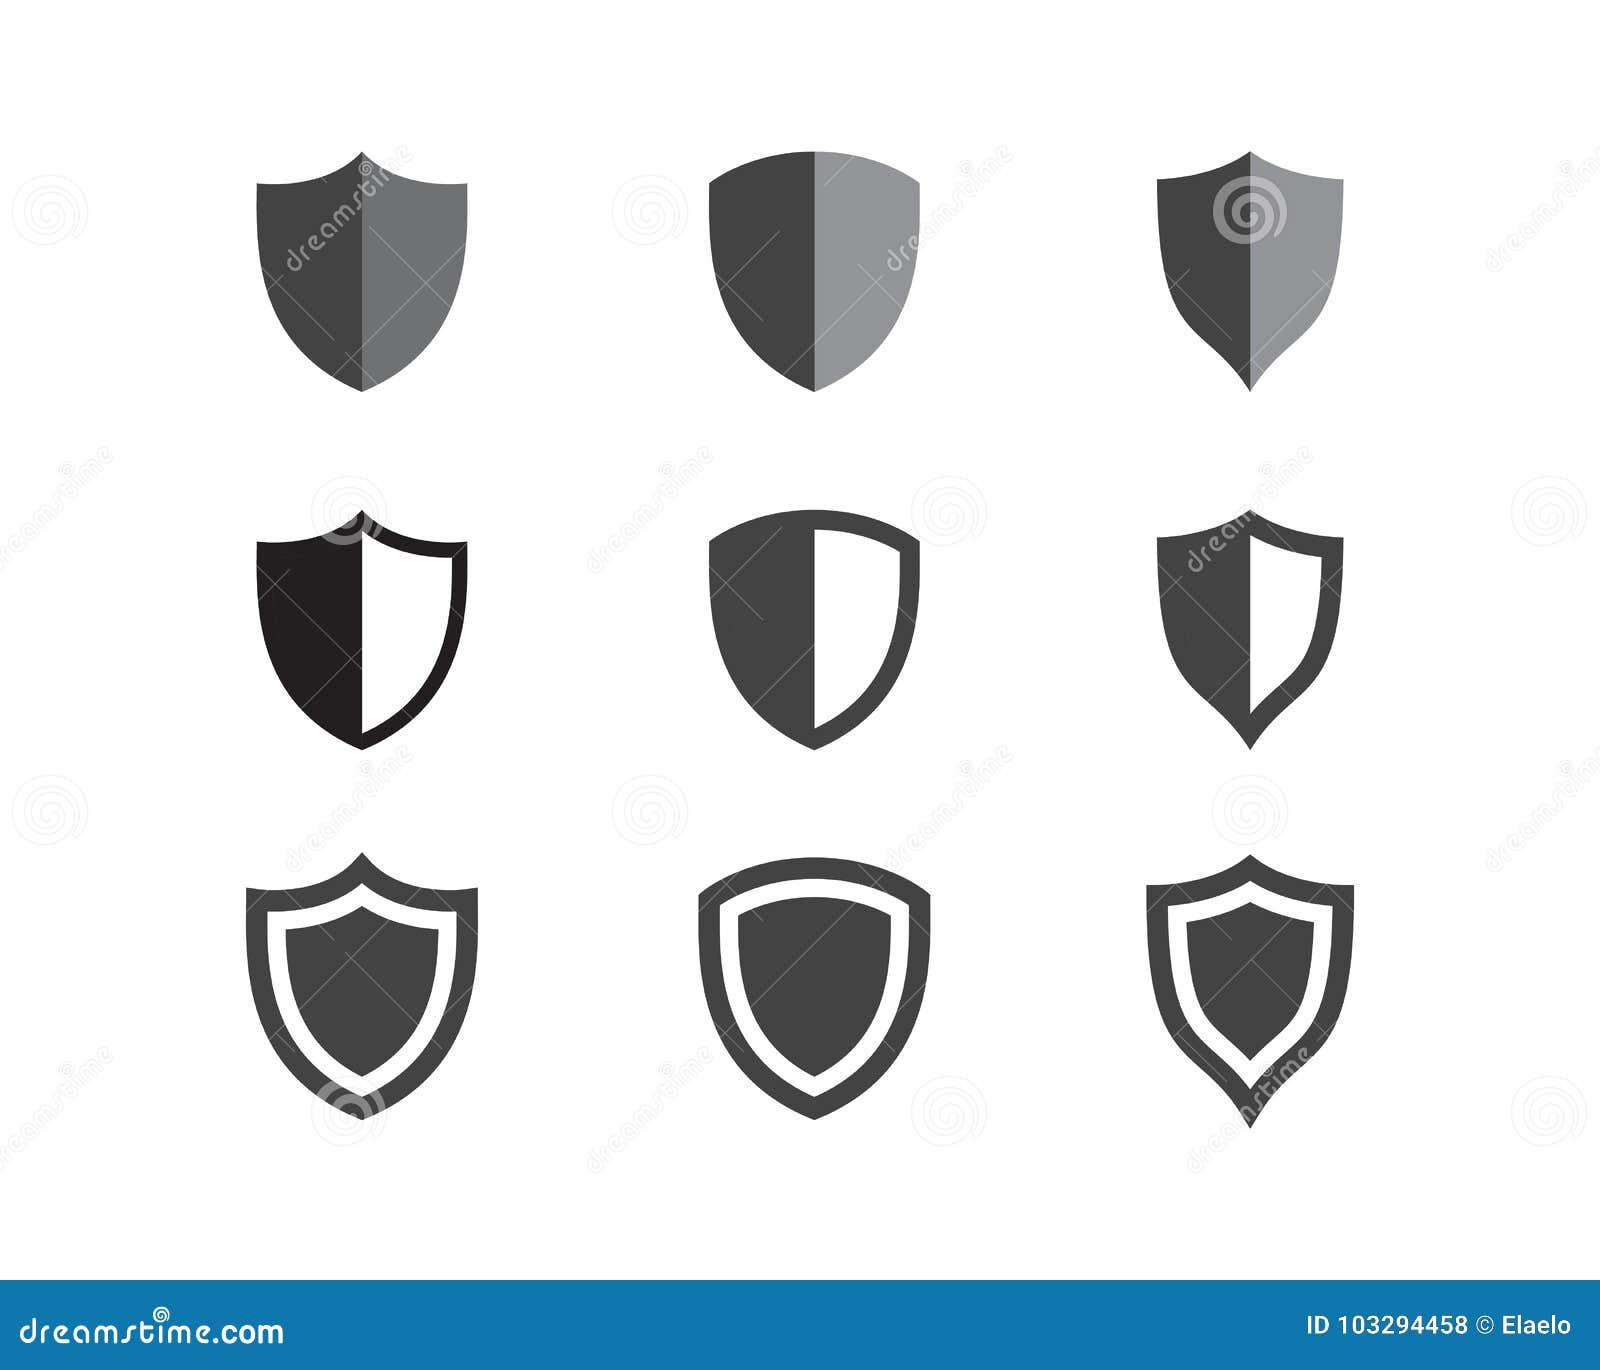 c51139b07ce89 Spartan helmet logo template vector icon design. More similar stock  illustrations